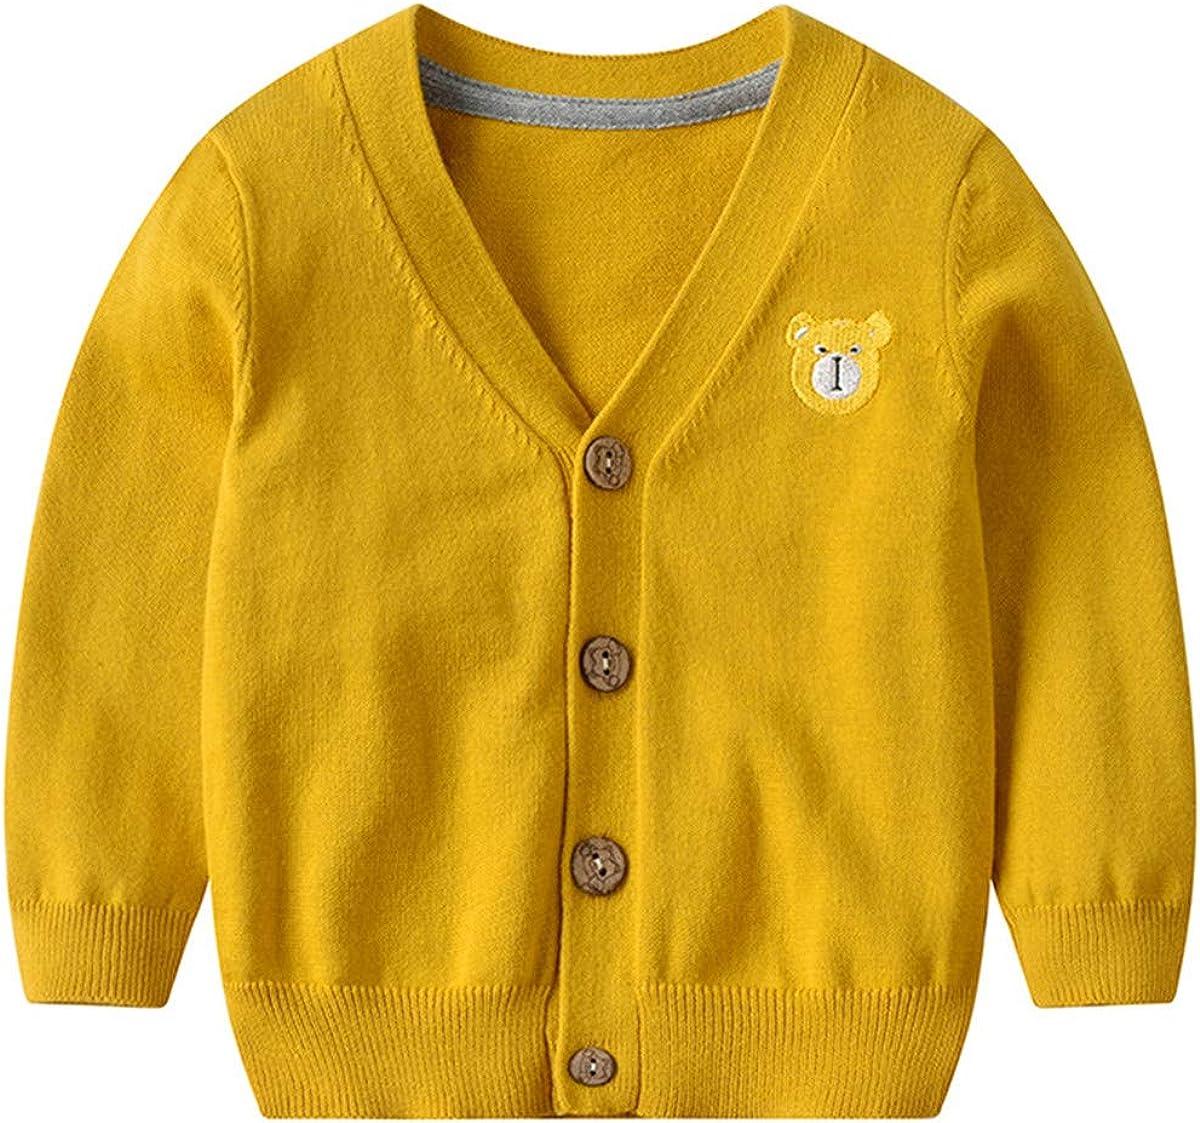 Baby Girls Boys Spring Fall Cute Knit Cardigan Front Button V-Neck Bear Sweatshirt Long Sleeve Sweater